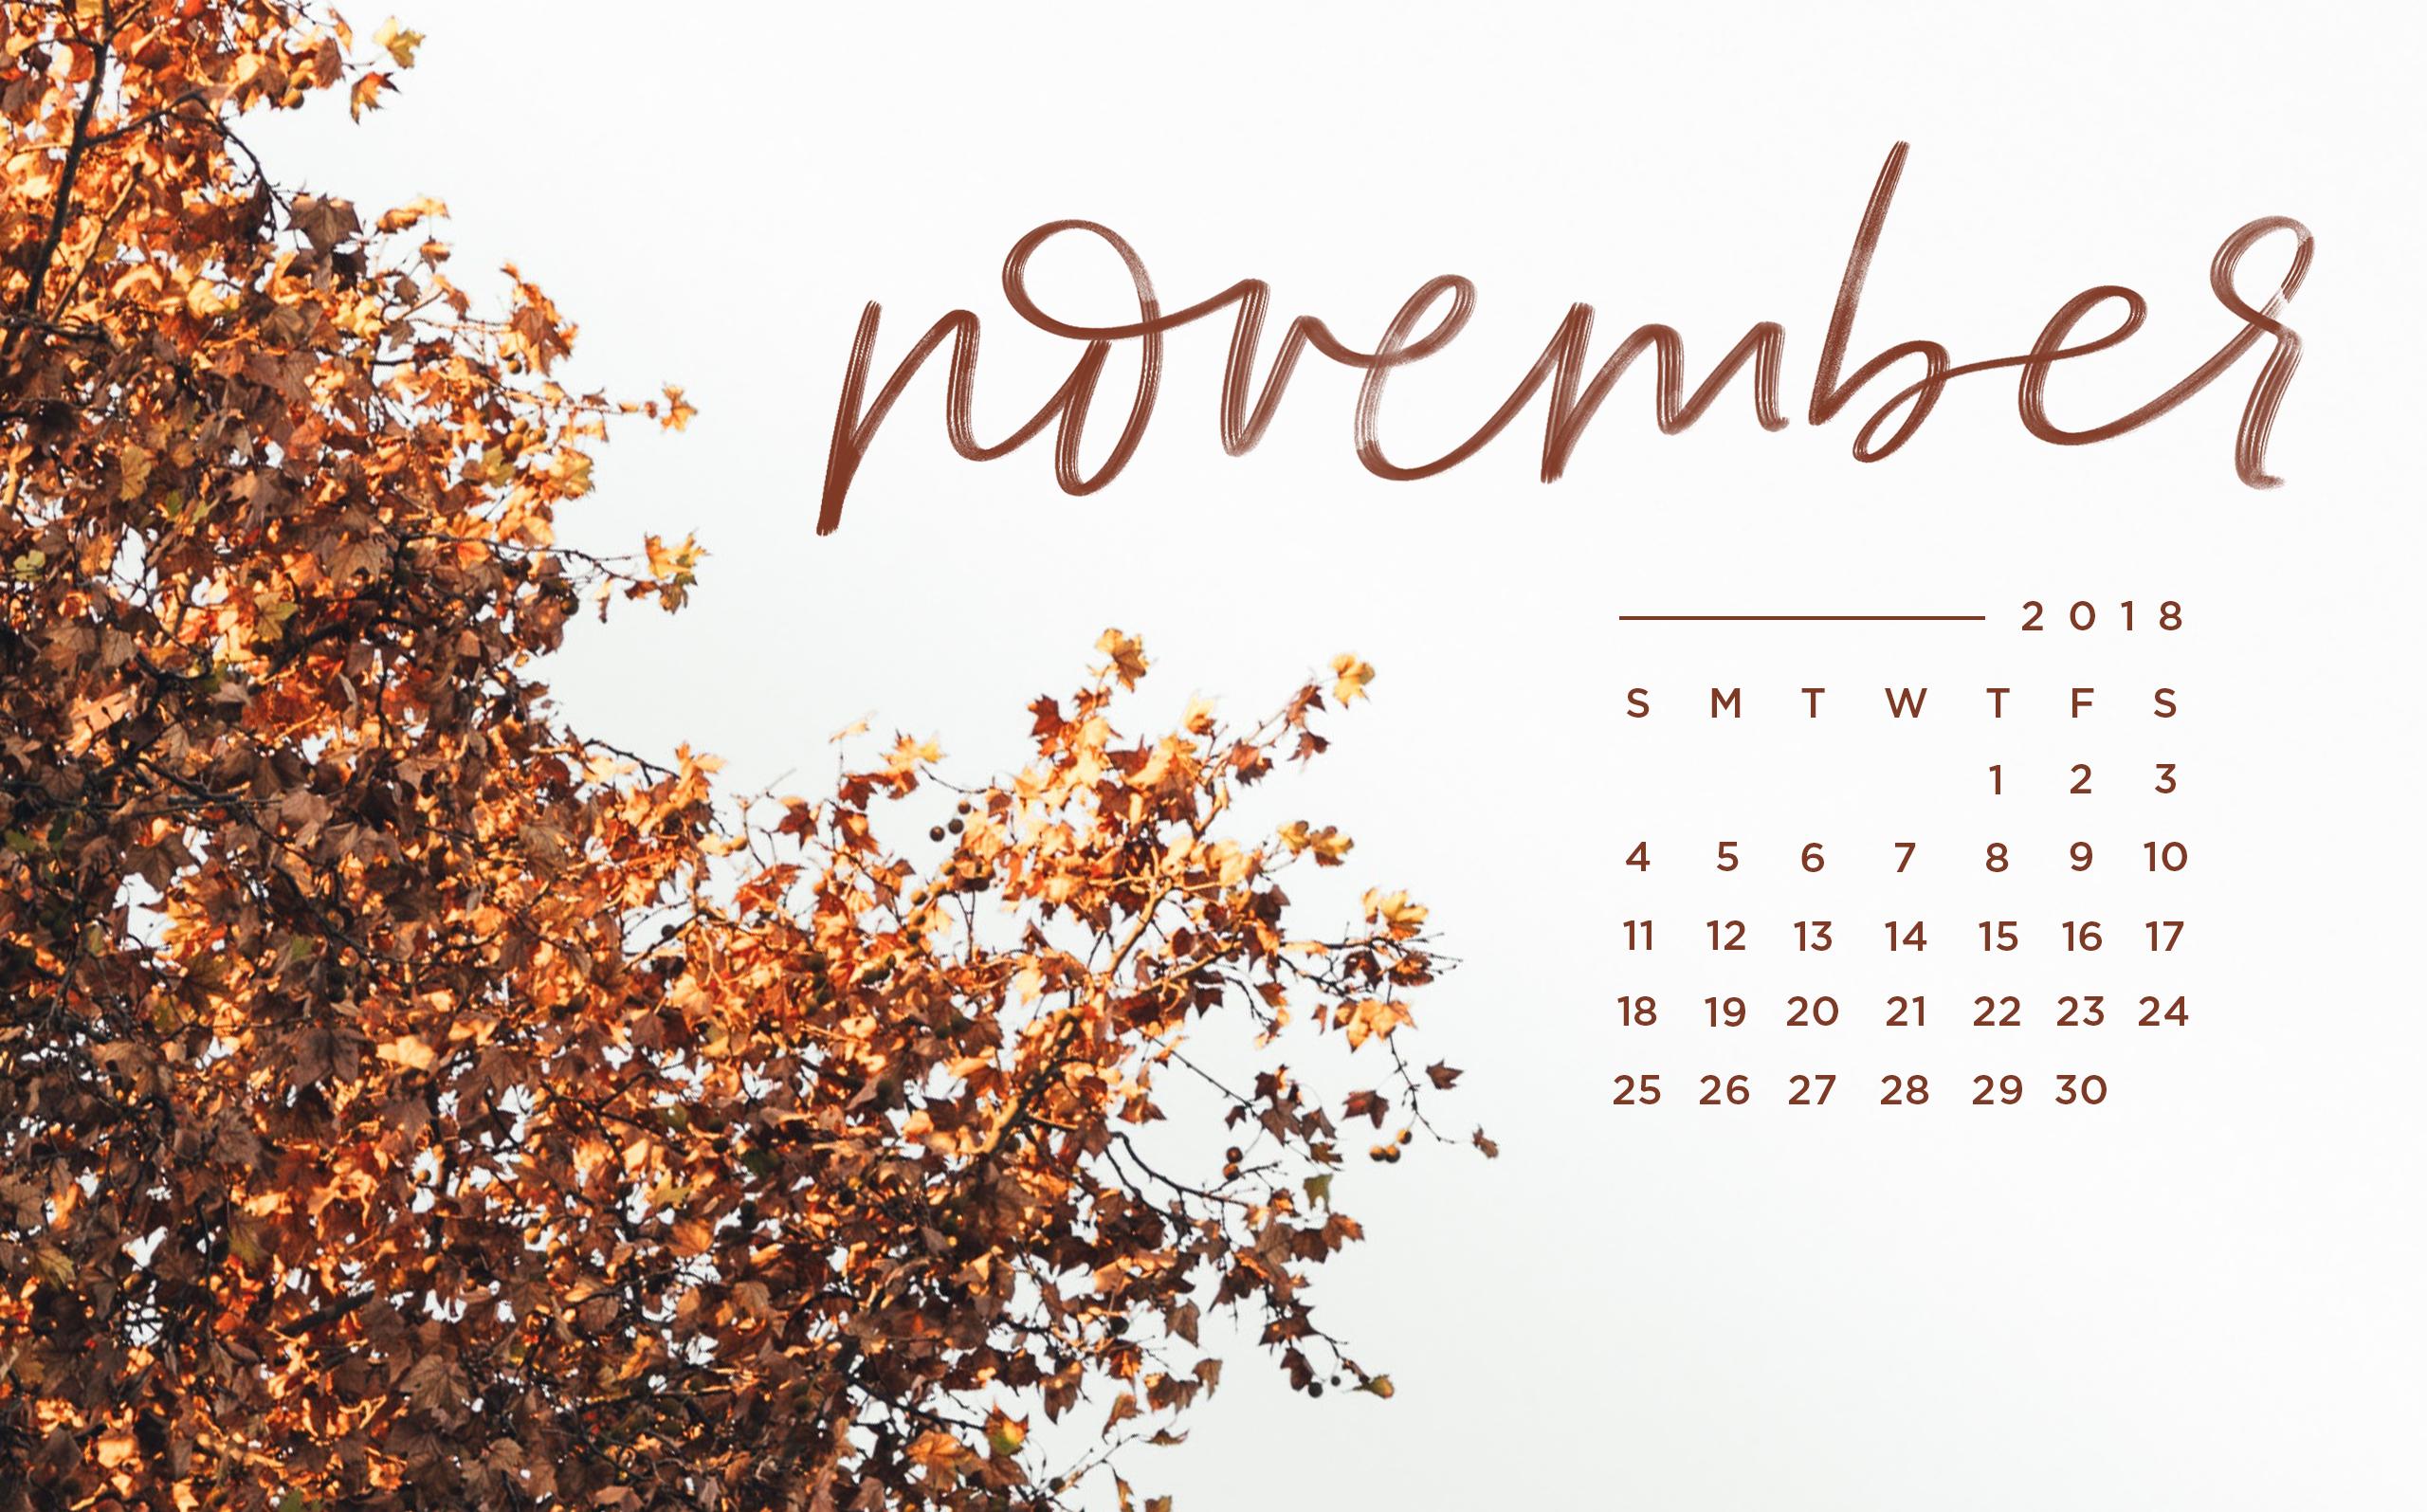 Free Downloadable Tech Backgrounds For November 2018 Desktop Wallpaper Calendar November Backgrounds Christmas Desktop Wallpaper